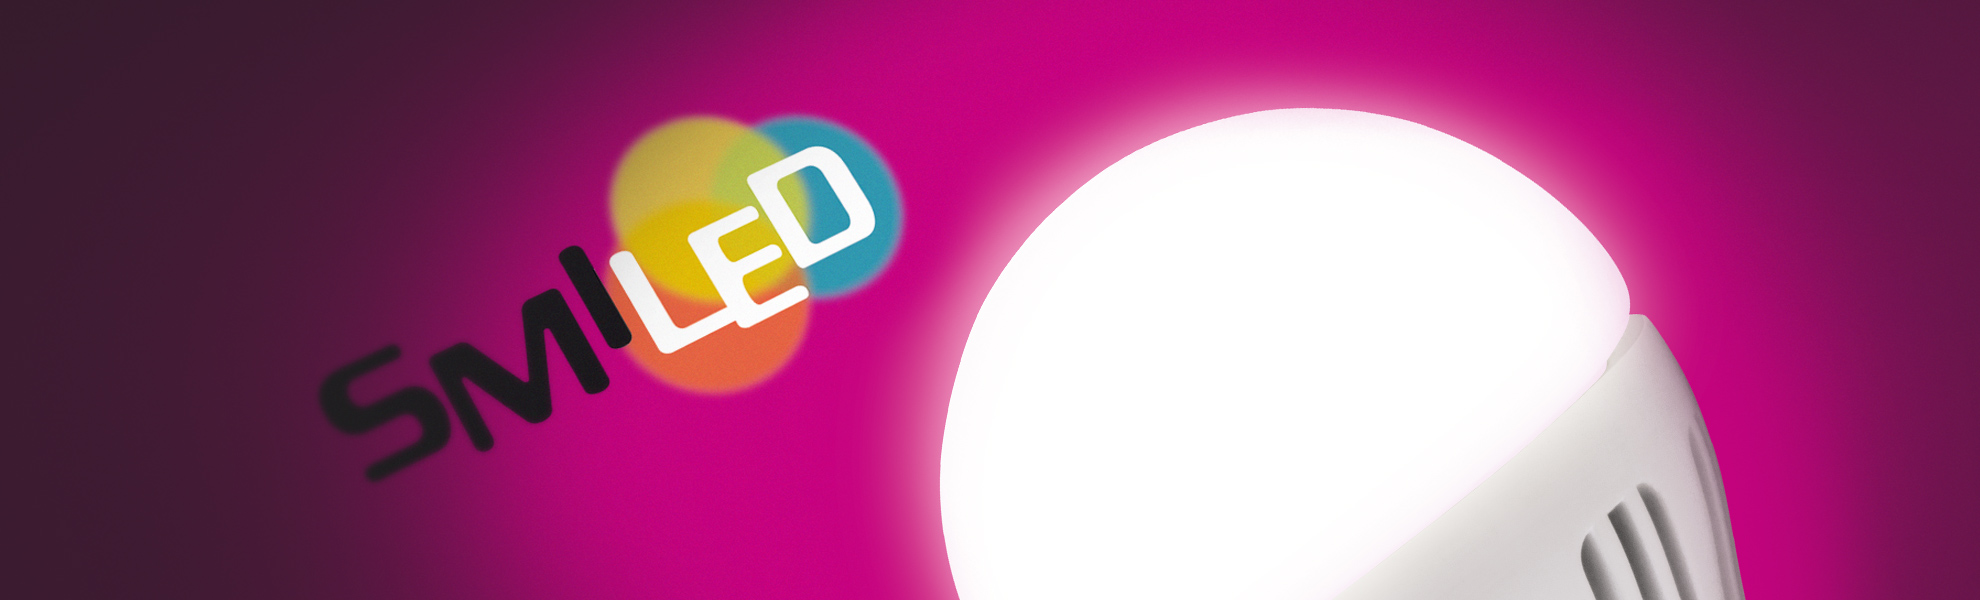 chelles-e-hayashi-design-portfolio-smiled-marca-identidade-grafico-embalagem